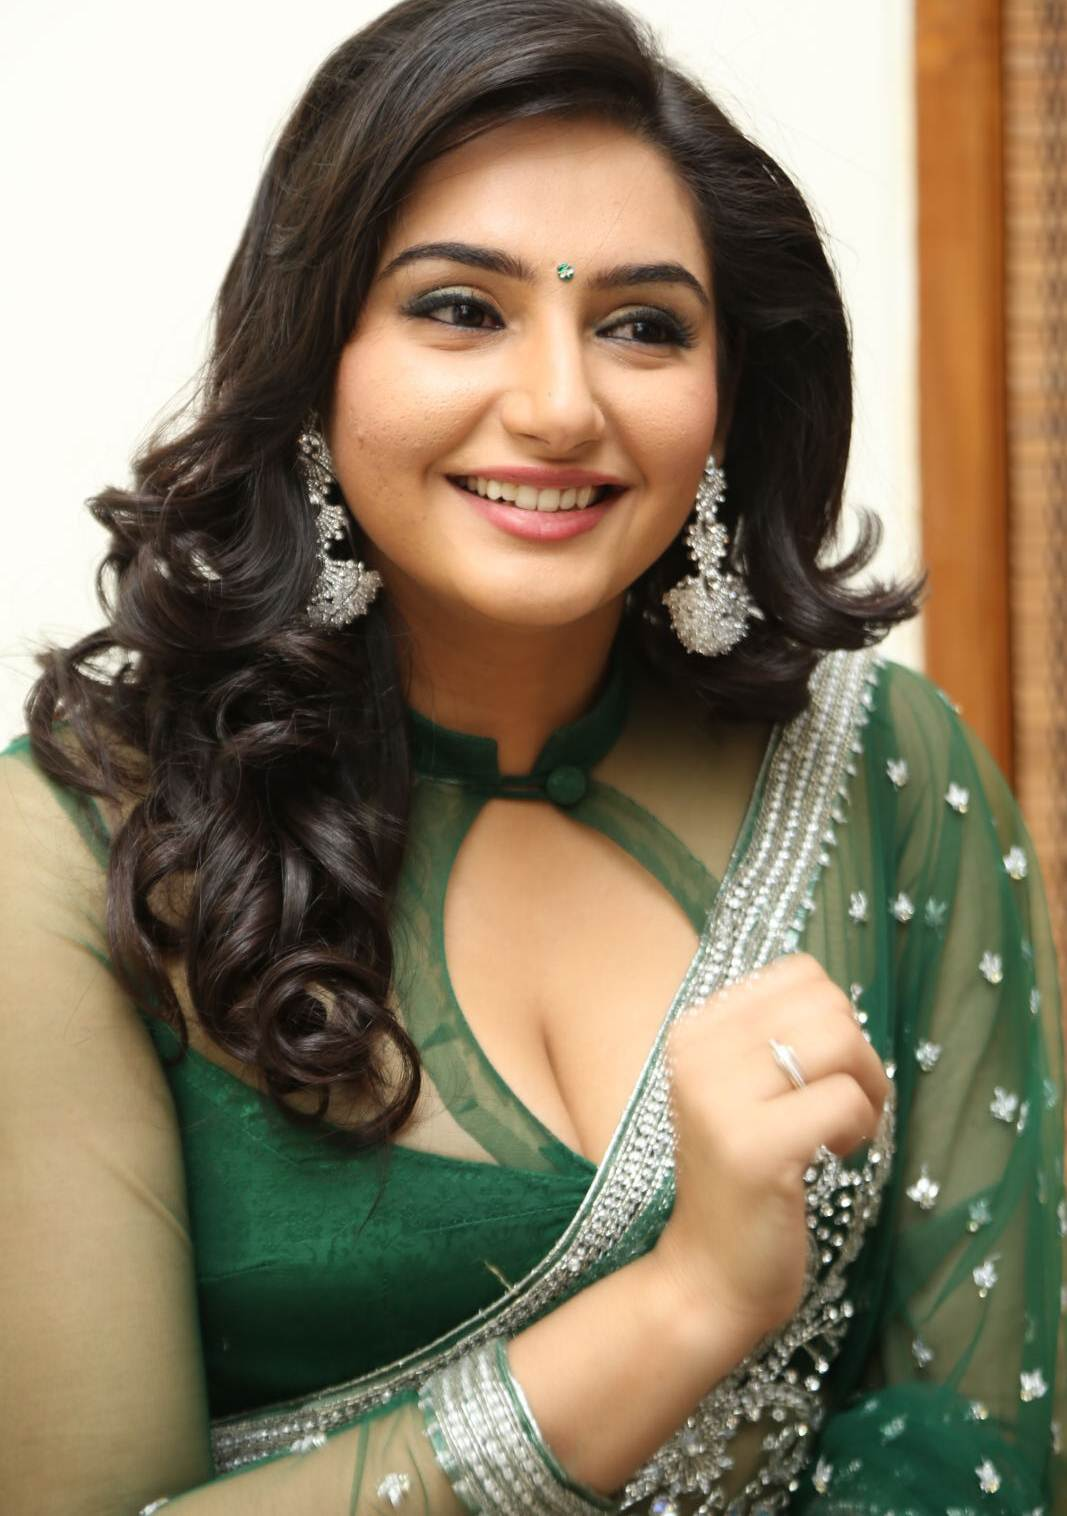 ragini-dwivedi-hot-cleavage-stills-8